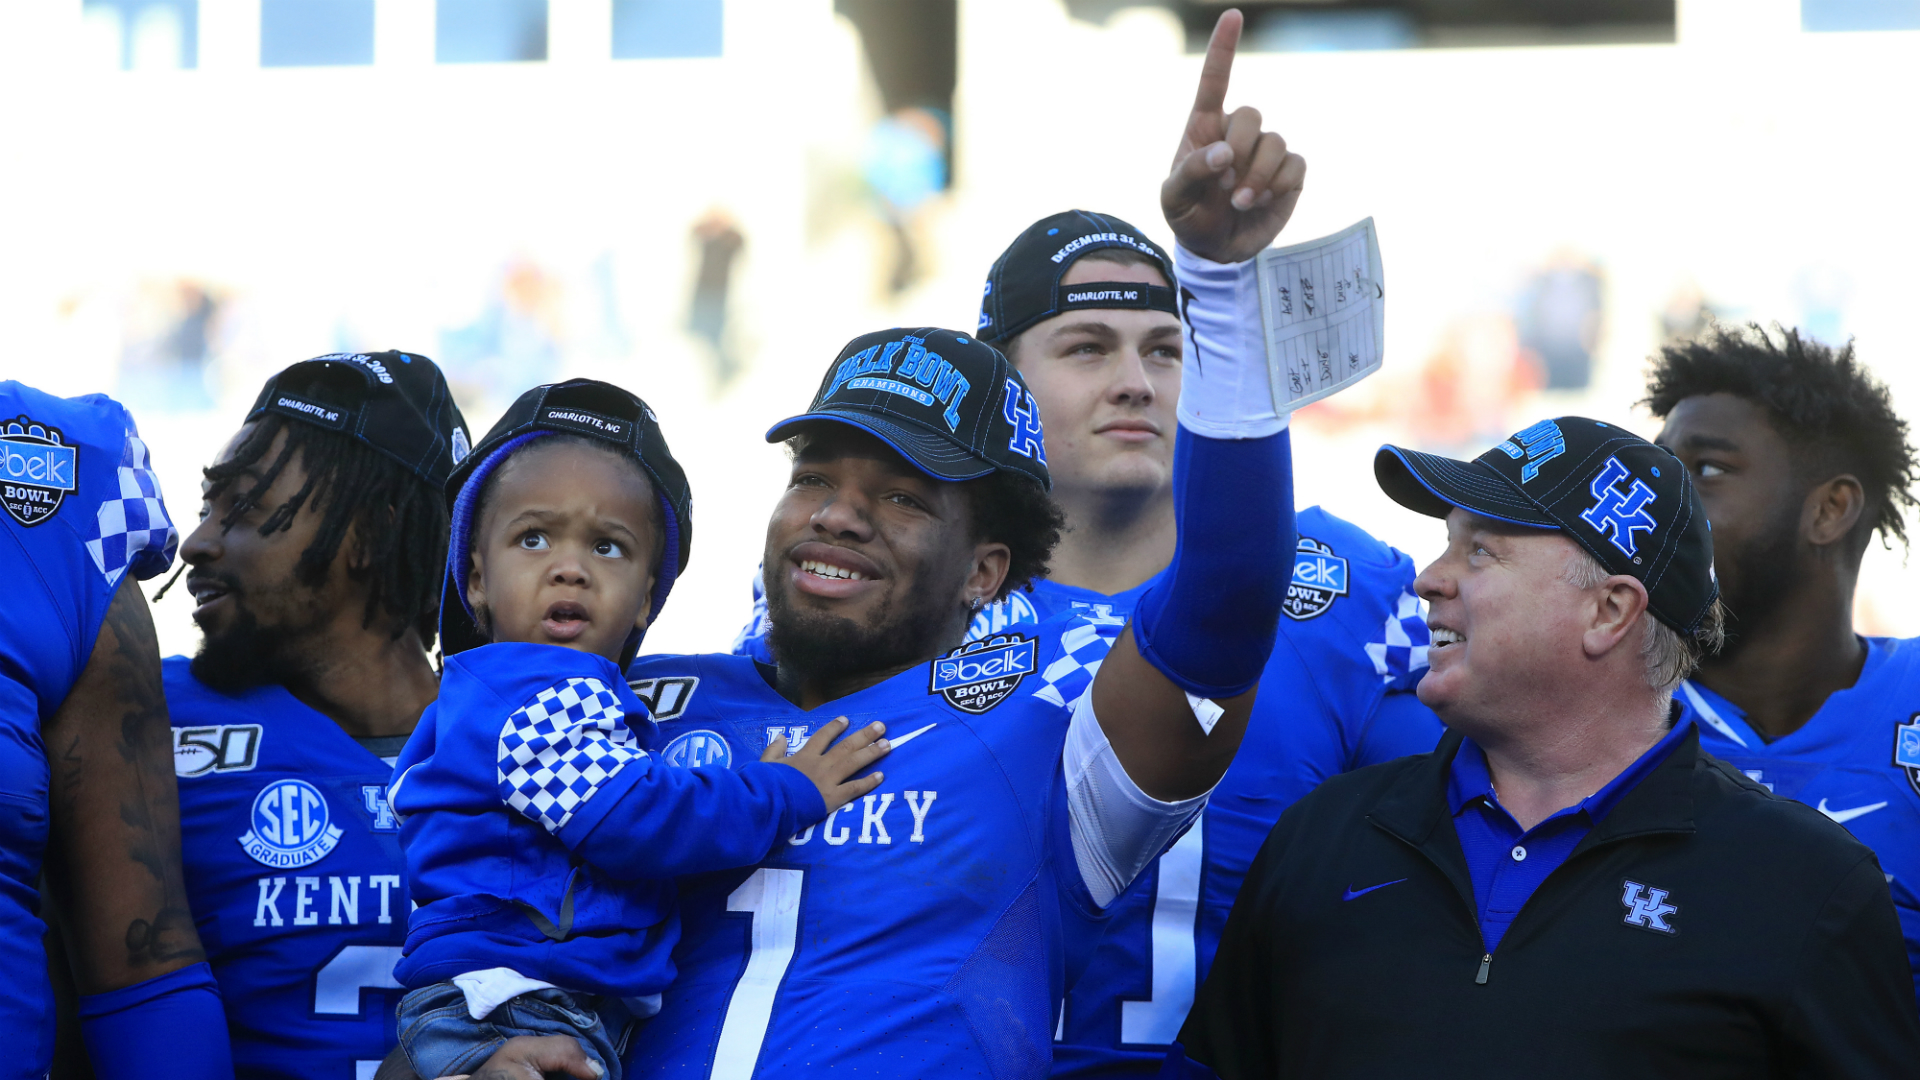 Lynn Bowden cimenta su legado de Kentucky con la excelente actuación de Belk Bowl 2